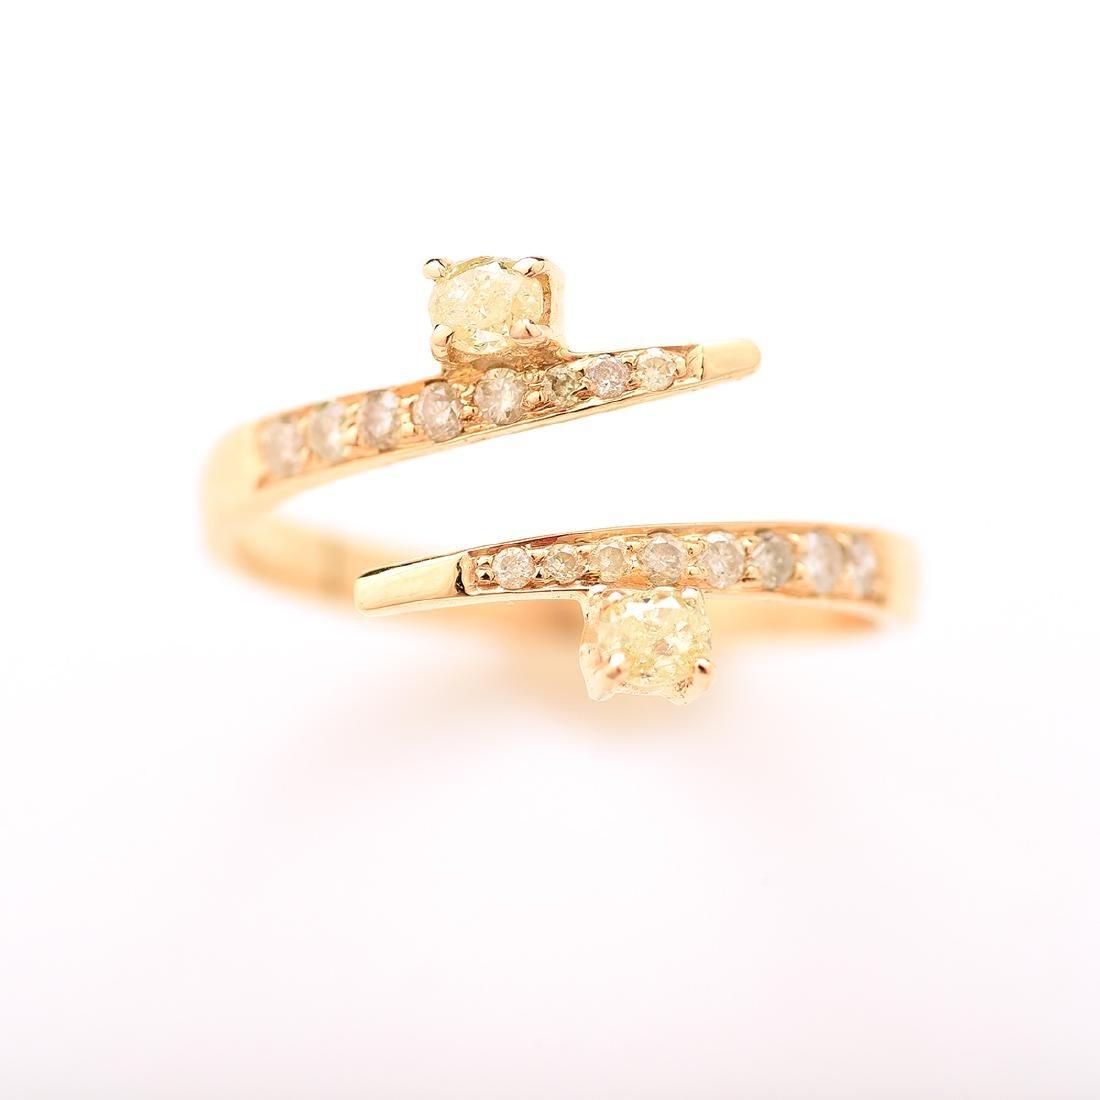 Diamond, 18k Yellow Gold Bypass Ring. - 2